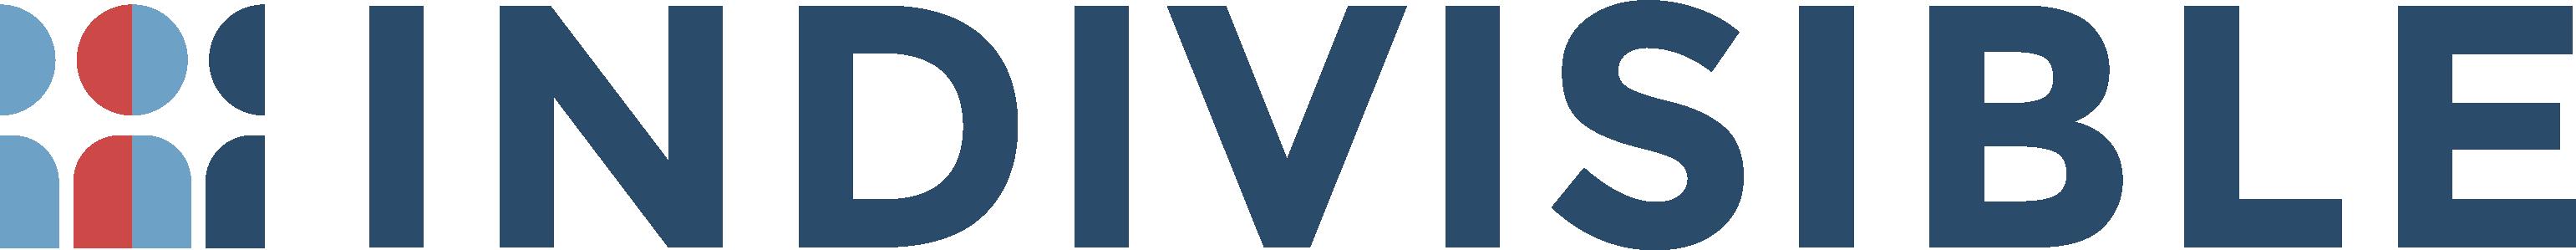 Indivisible - logo